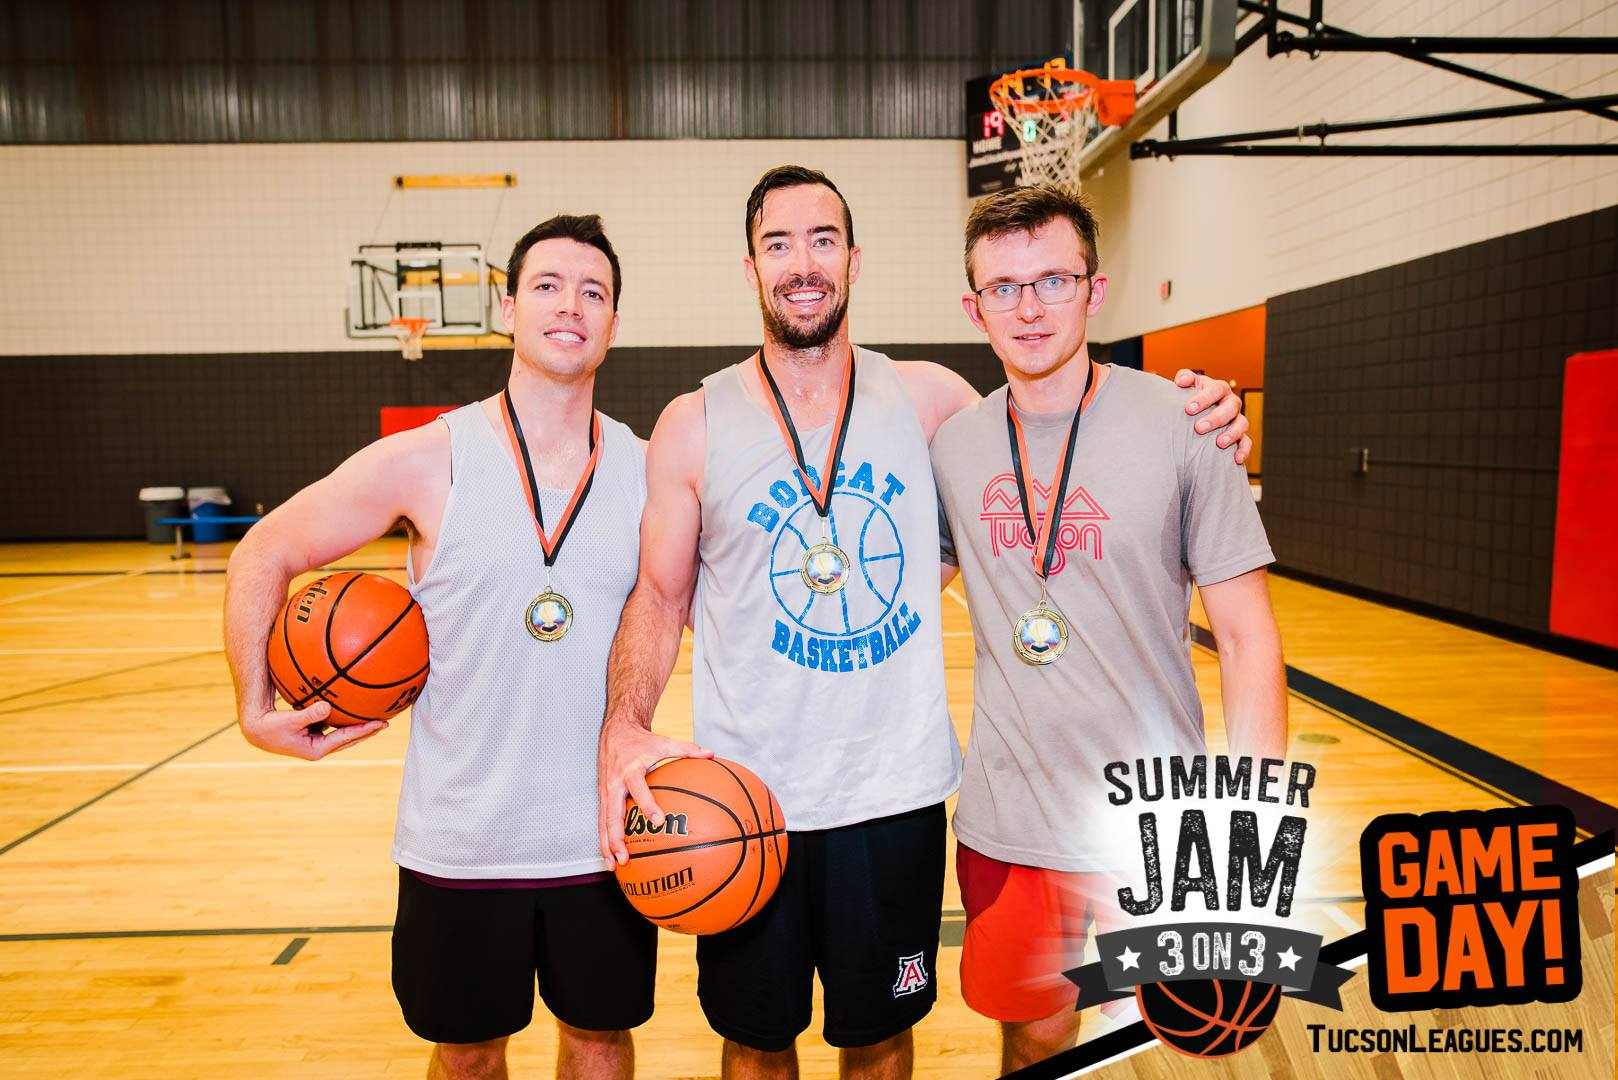 Jun 16th Summer Jam 3 on 3 Men's Basketball Tournament Champions